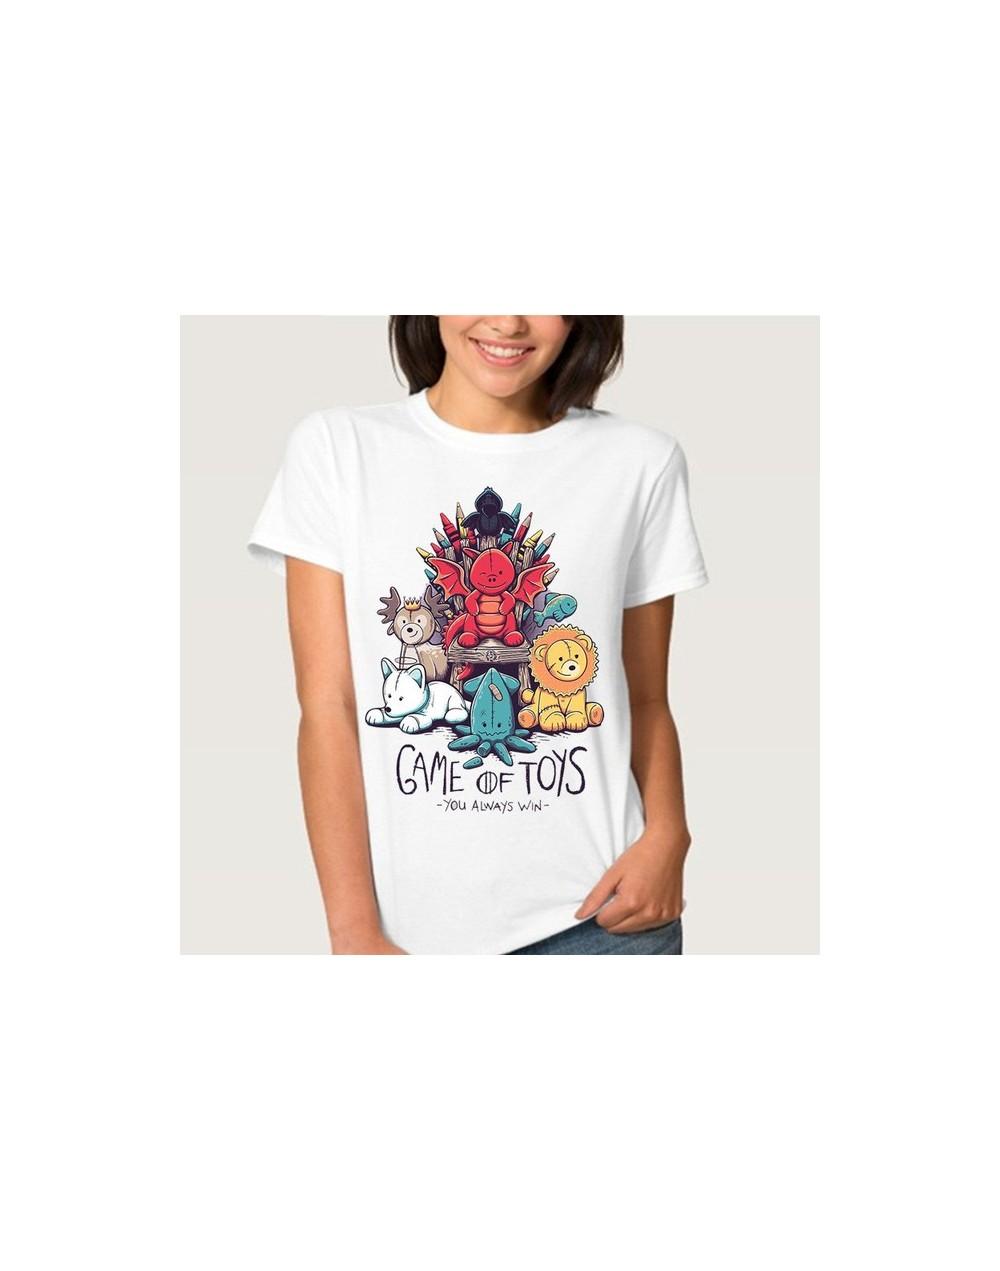 Game of Thrones Arya Stark NOT TODAY Mother of Dragons T Shirt Women T-shirt Female Top Tee Jon Snow Tshirt - 3012 - 4241261...